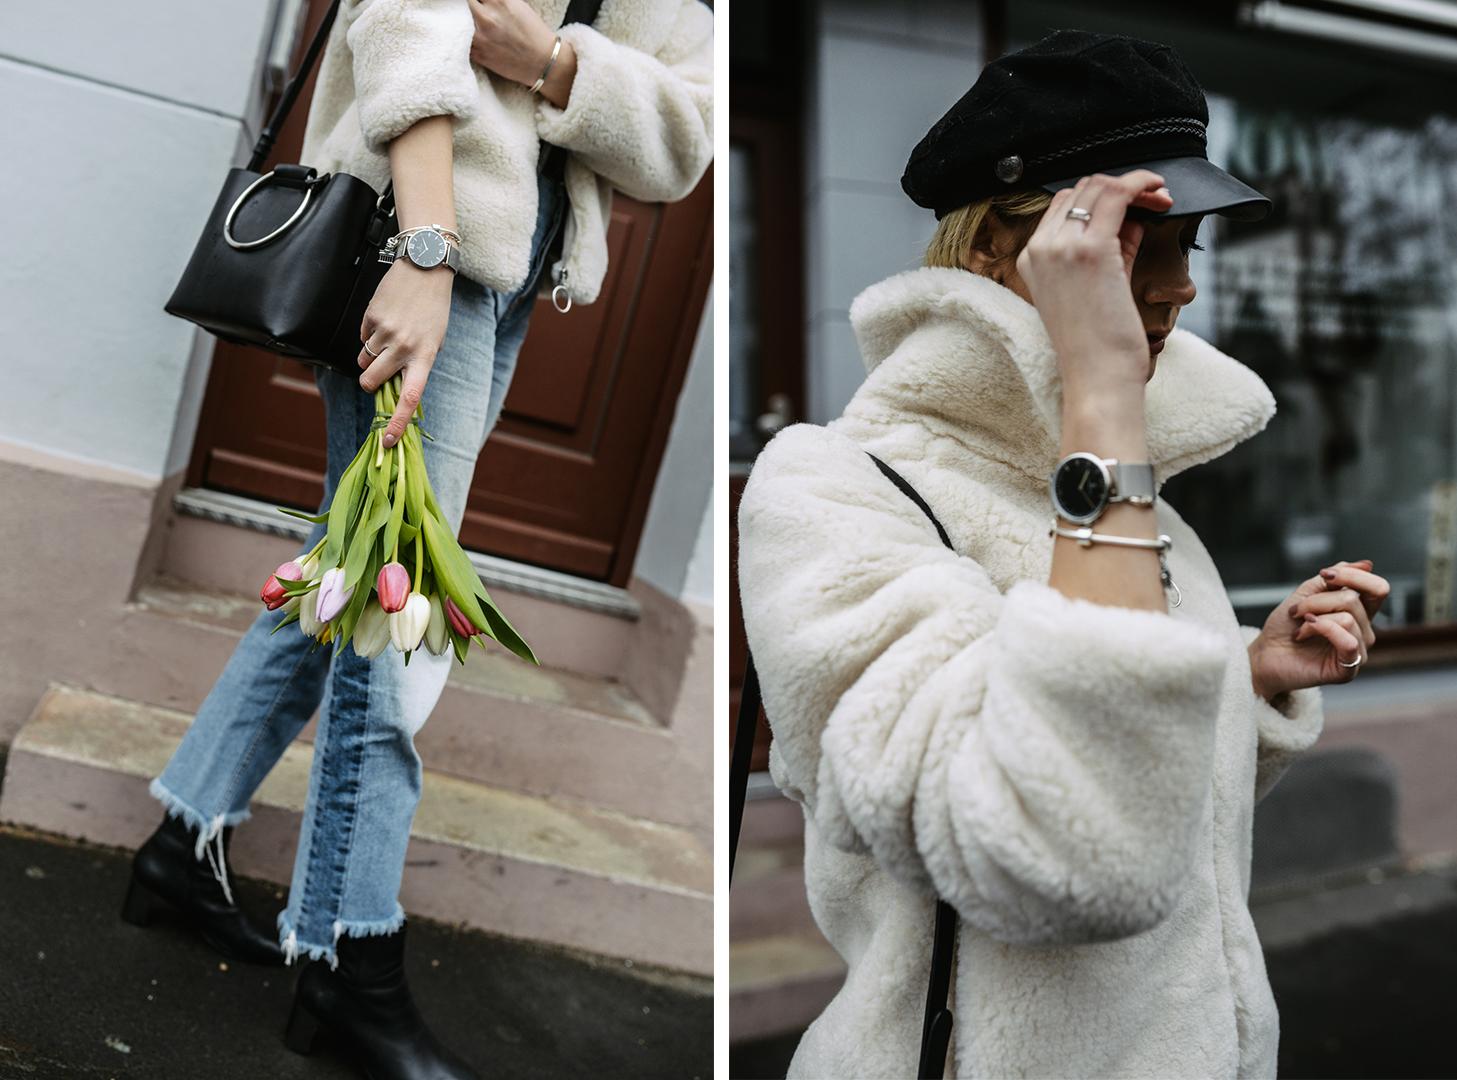 Teddyfleece Jacke kombinieren_Teddyfell_Style Inspiration_Winterjacke_Kiamisu_Fashionblog_6